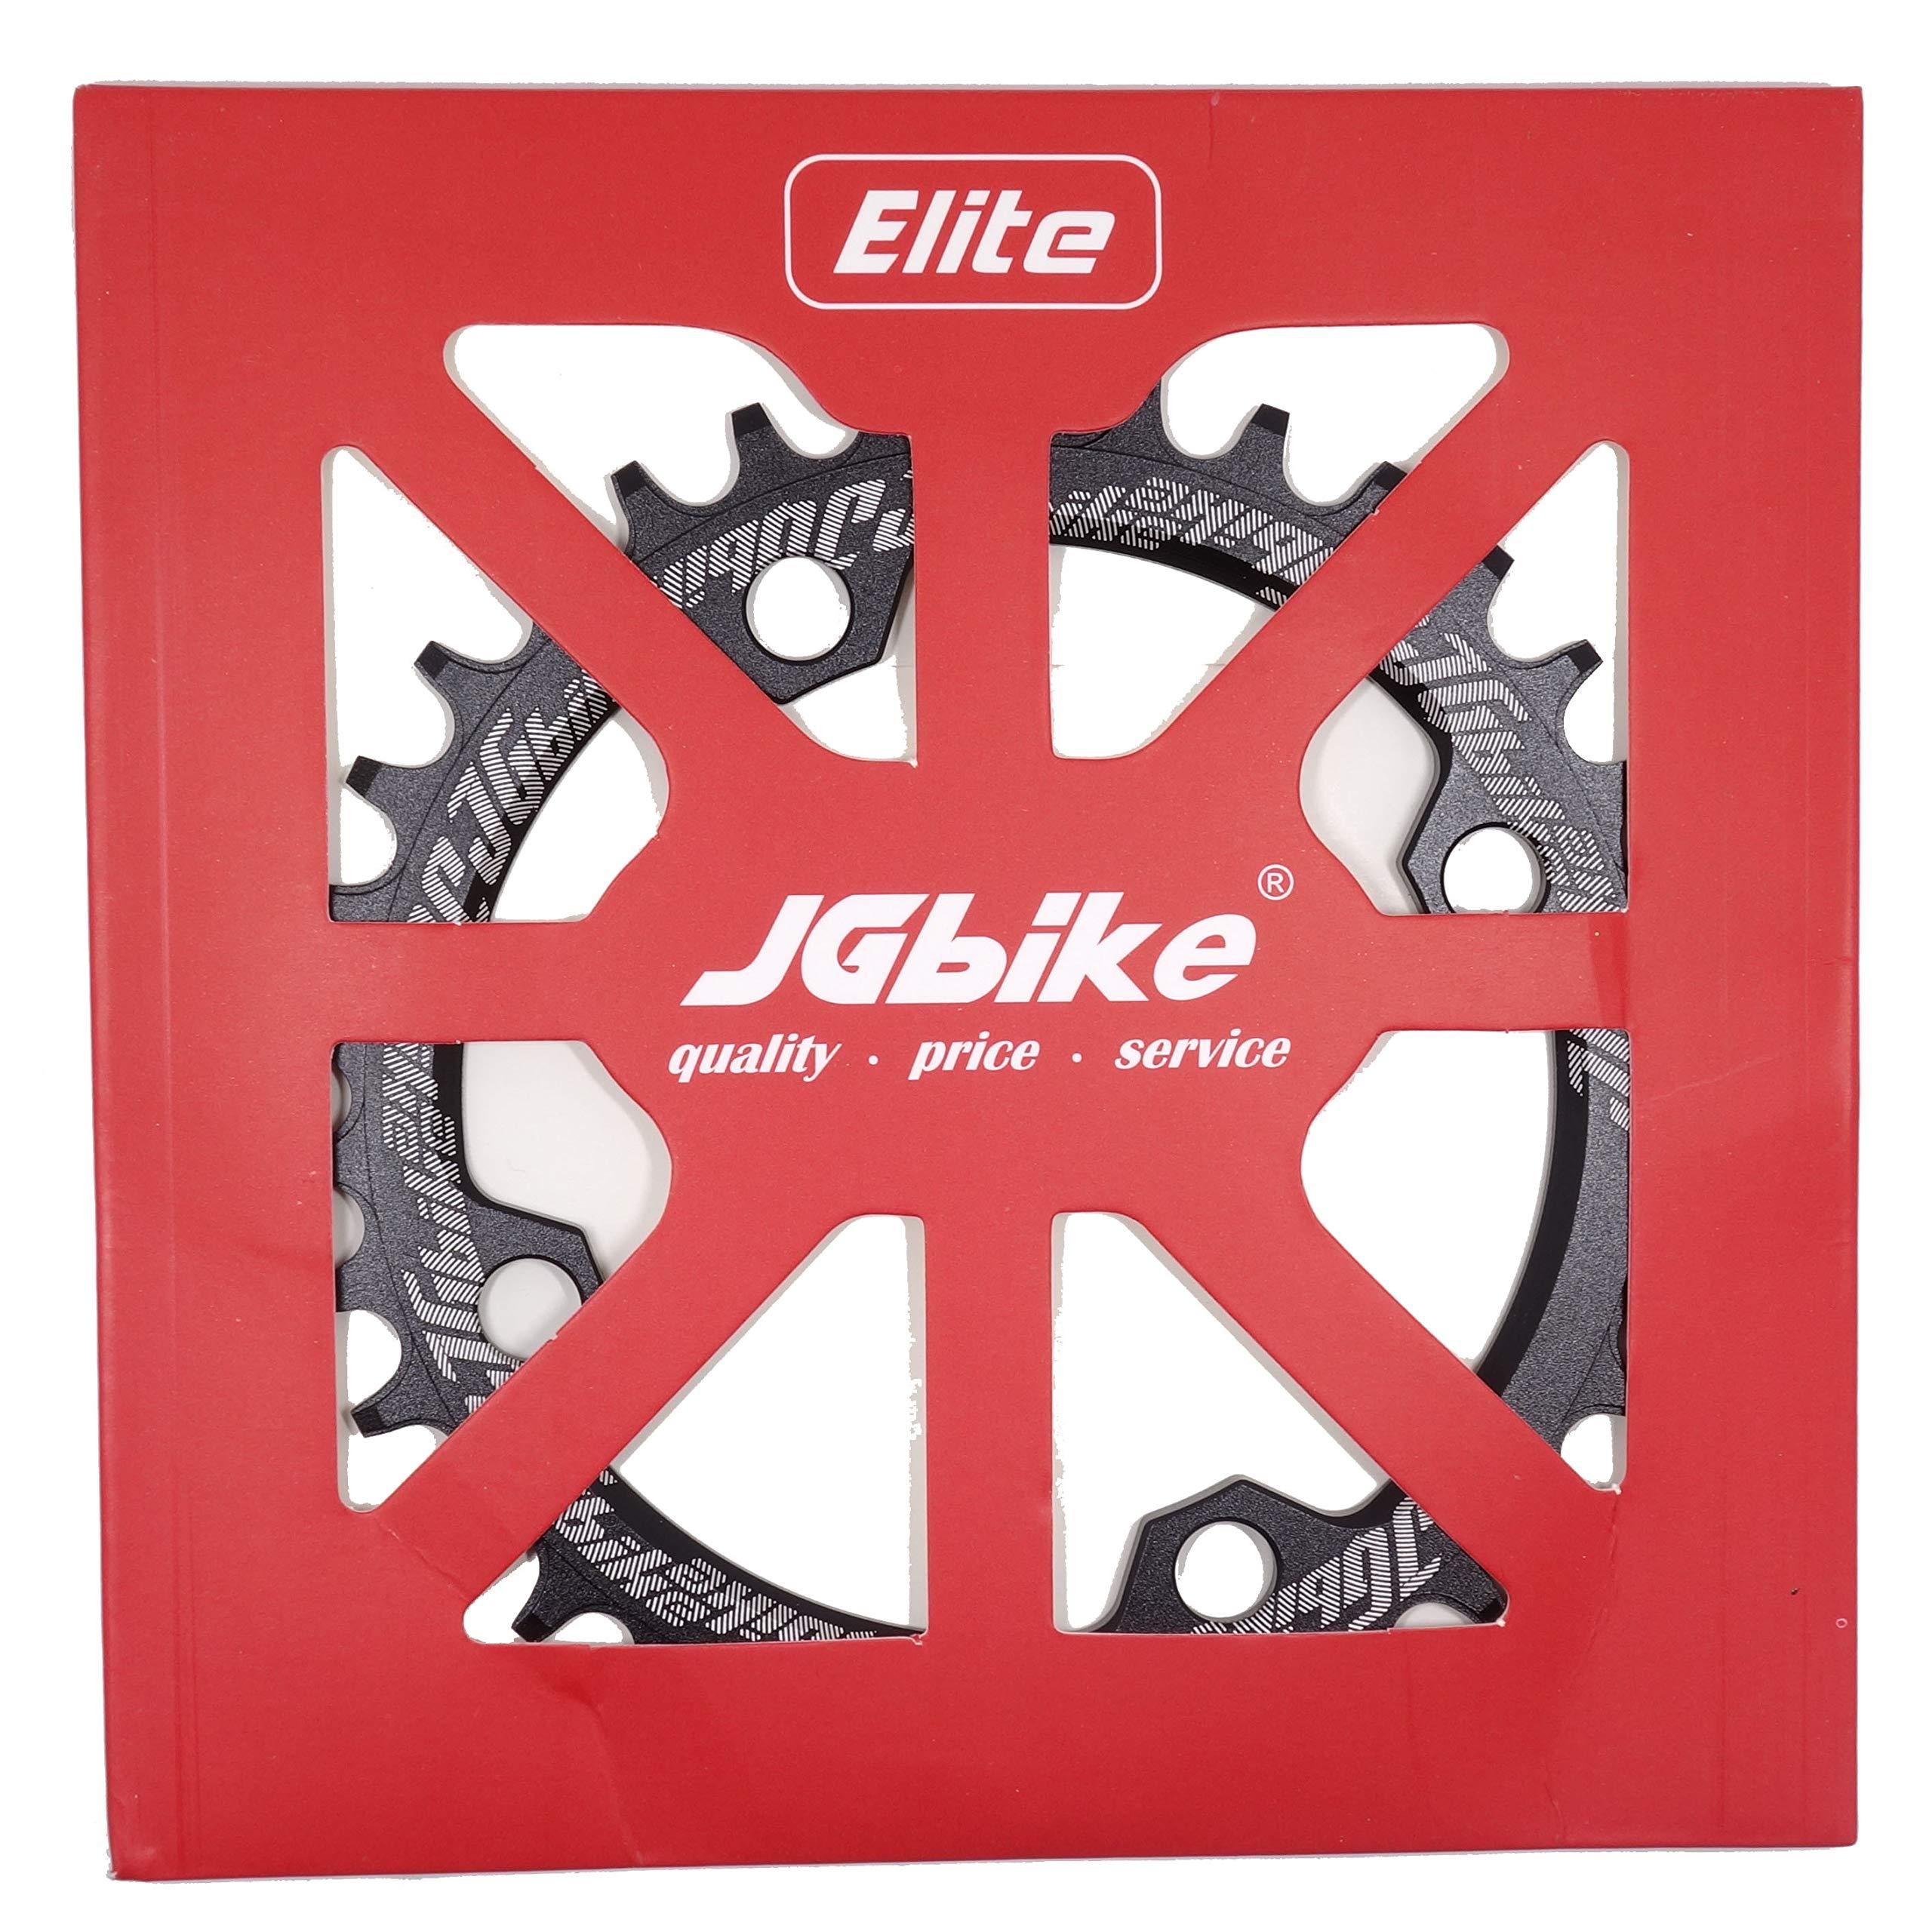 JGbike Elite Round Oval 104mm BCD 32T 34T 36T 38T Narrow Wide Single Chainring for MTB XC Trail e-Bike Fat Bike Mountain Bike Bicycle